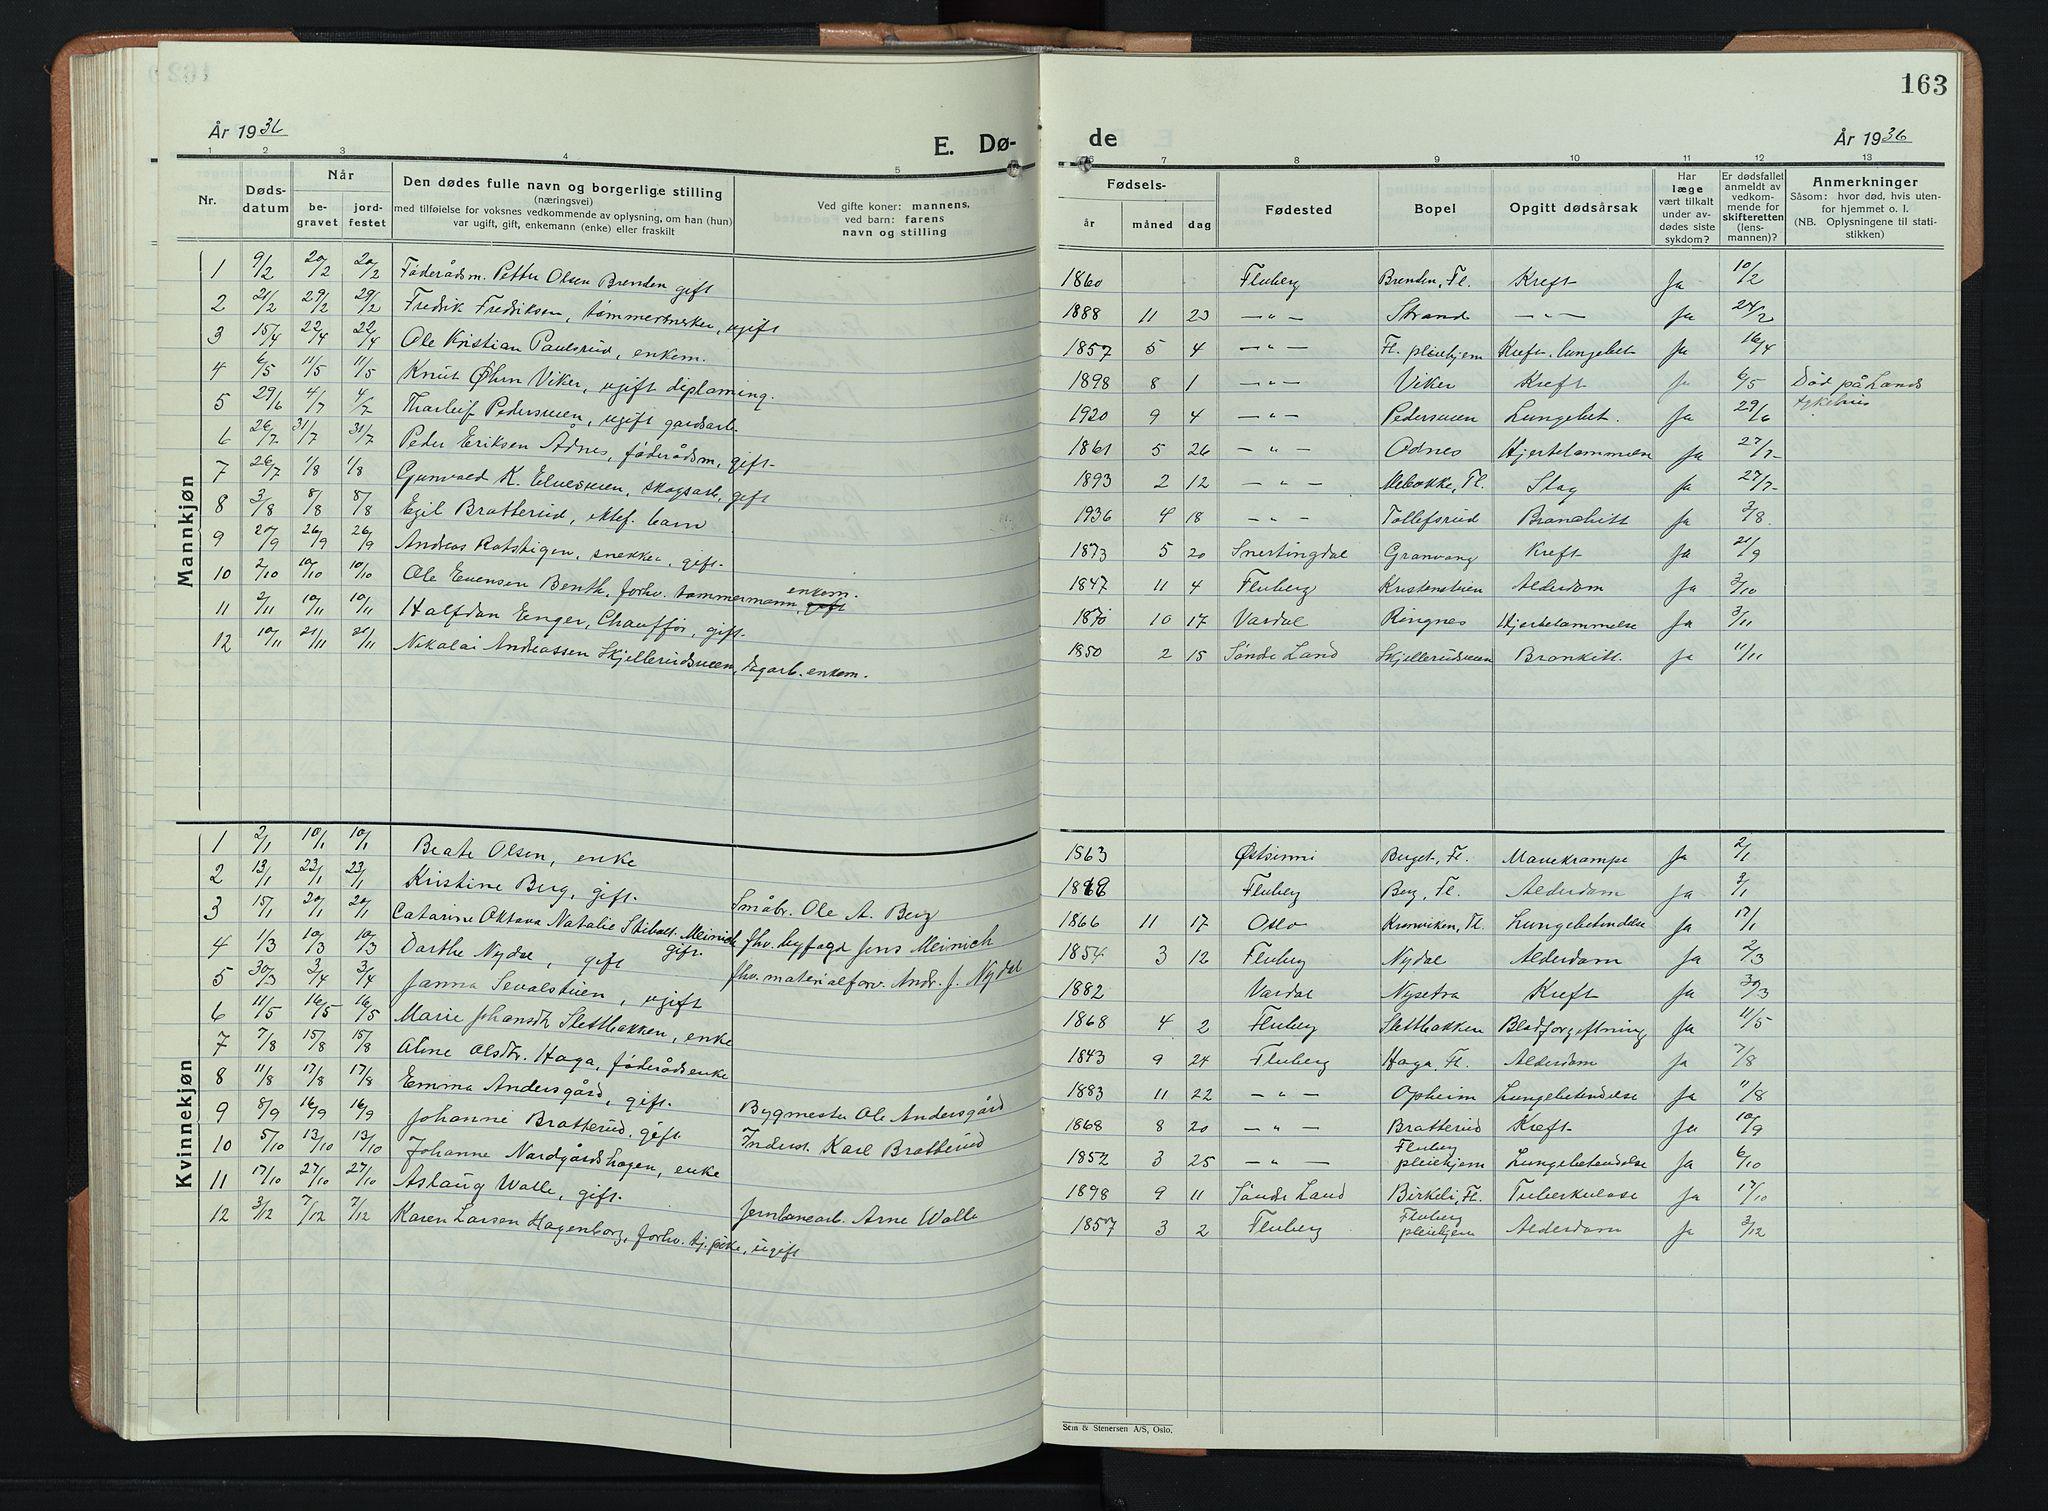 SAH, Søndre Land prestekontor, L/L0008: Klokkerbok nr. 8, 1926-1950, s. 163